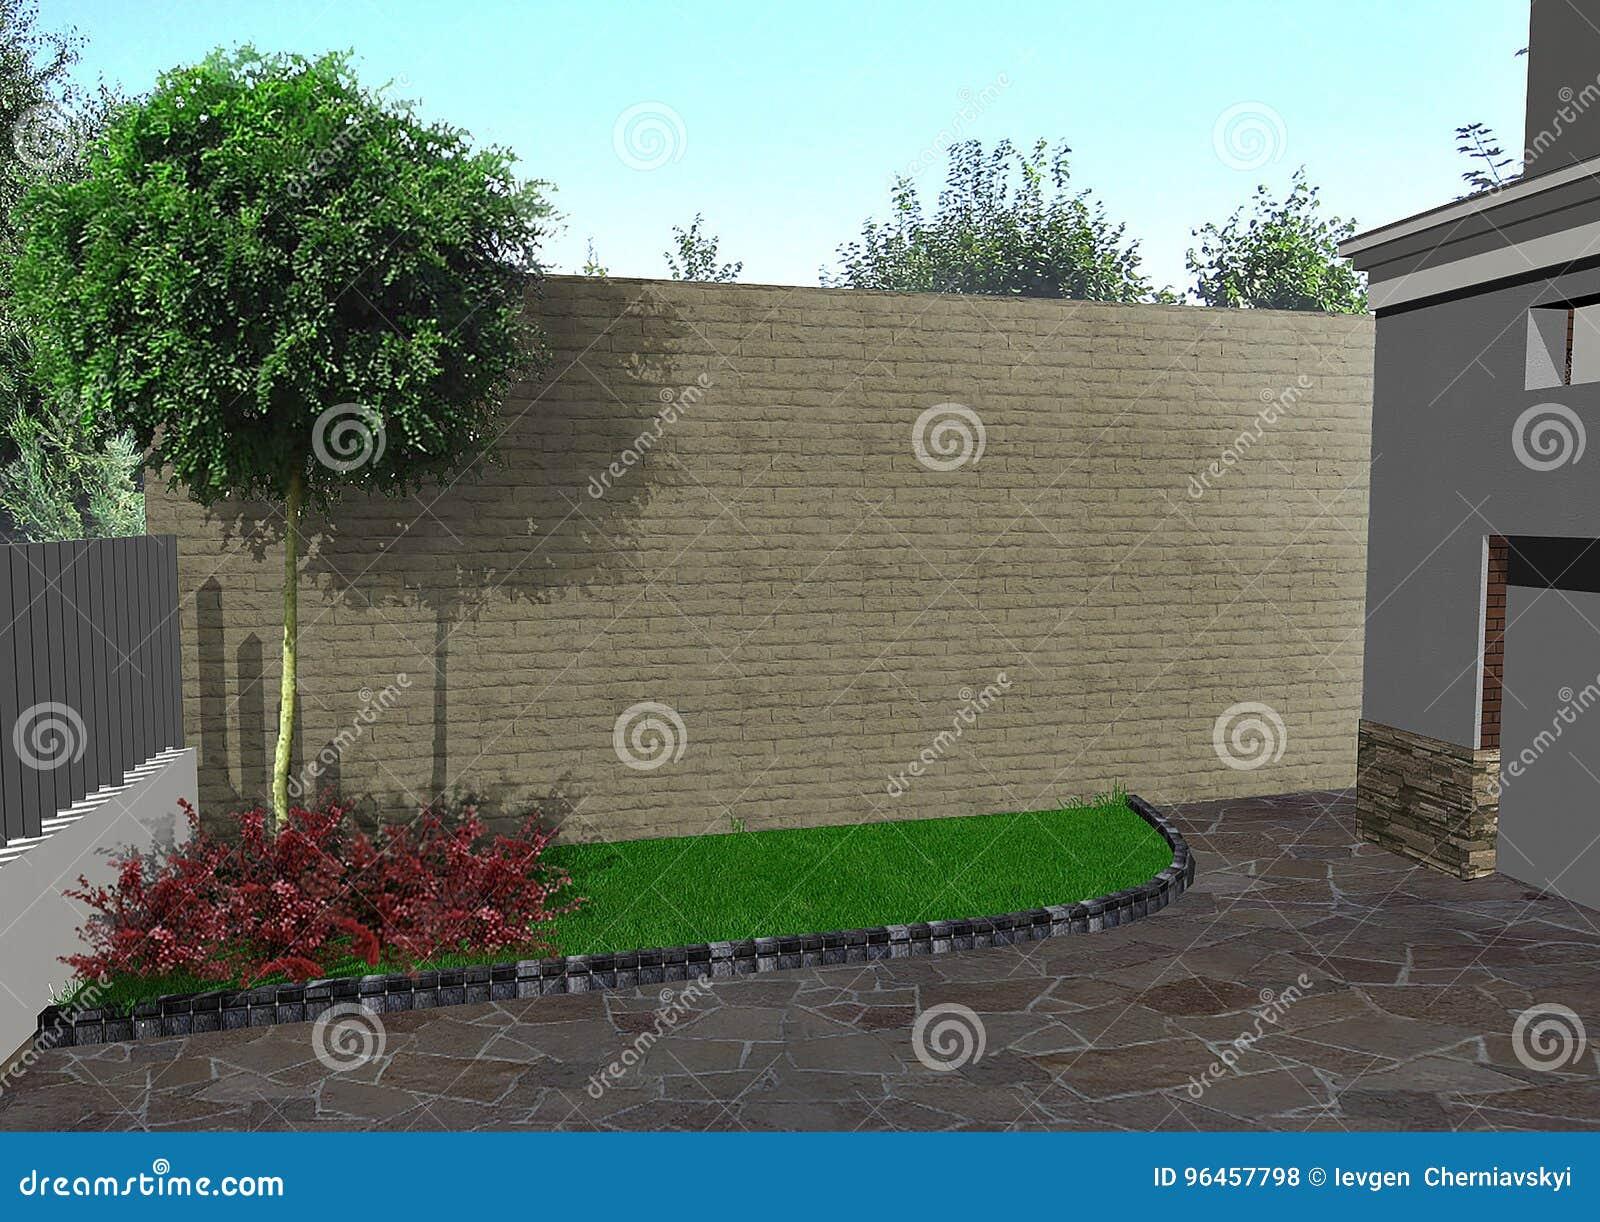 Driveway Design Ideas 3d Render Stock Illustration Illustration